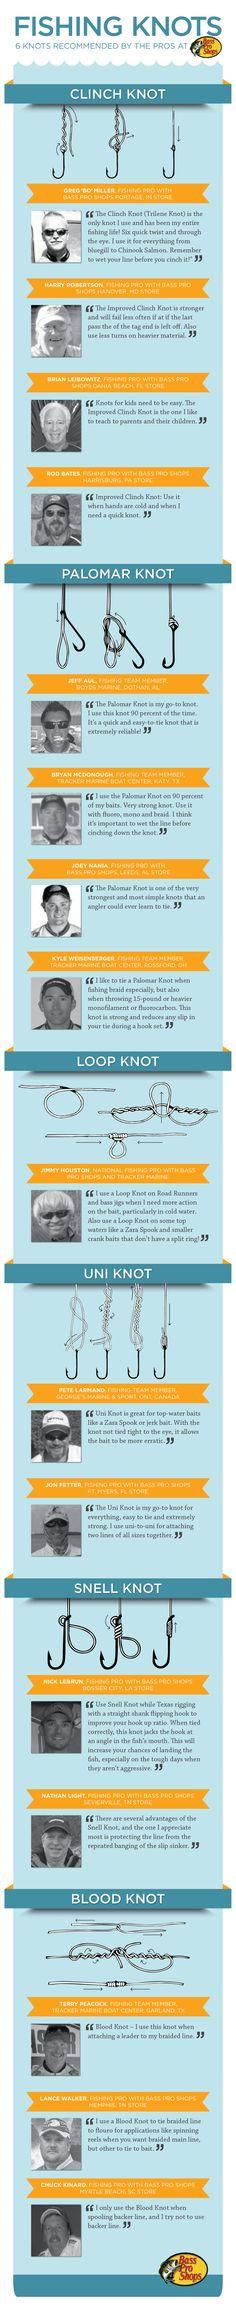 best fishing knots